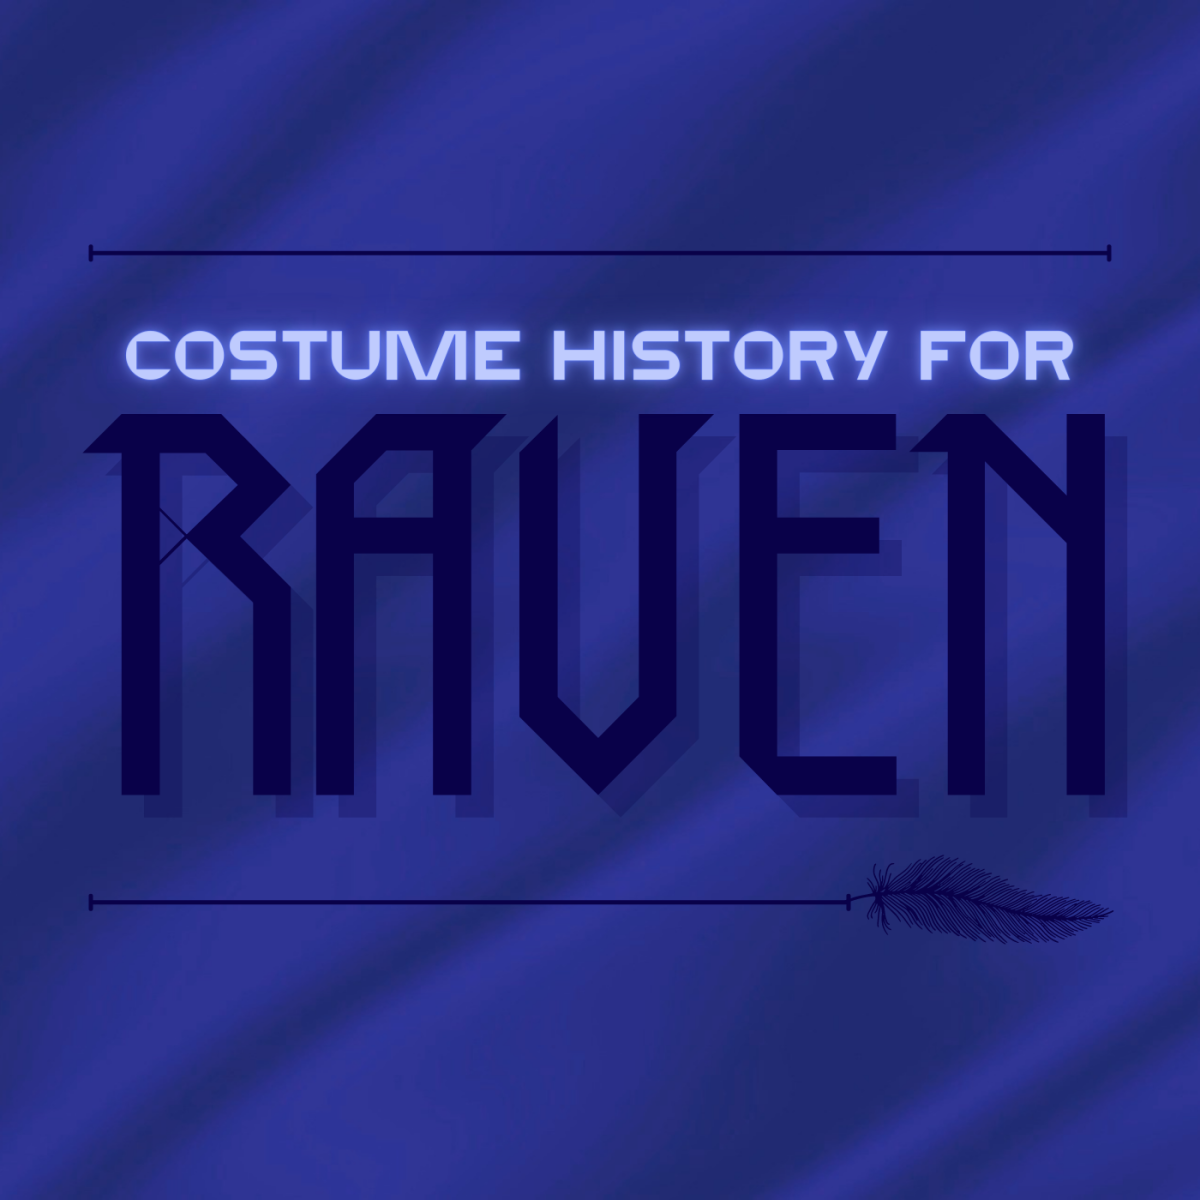 The History of Raven's Costume (DC Comics)